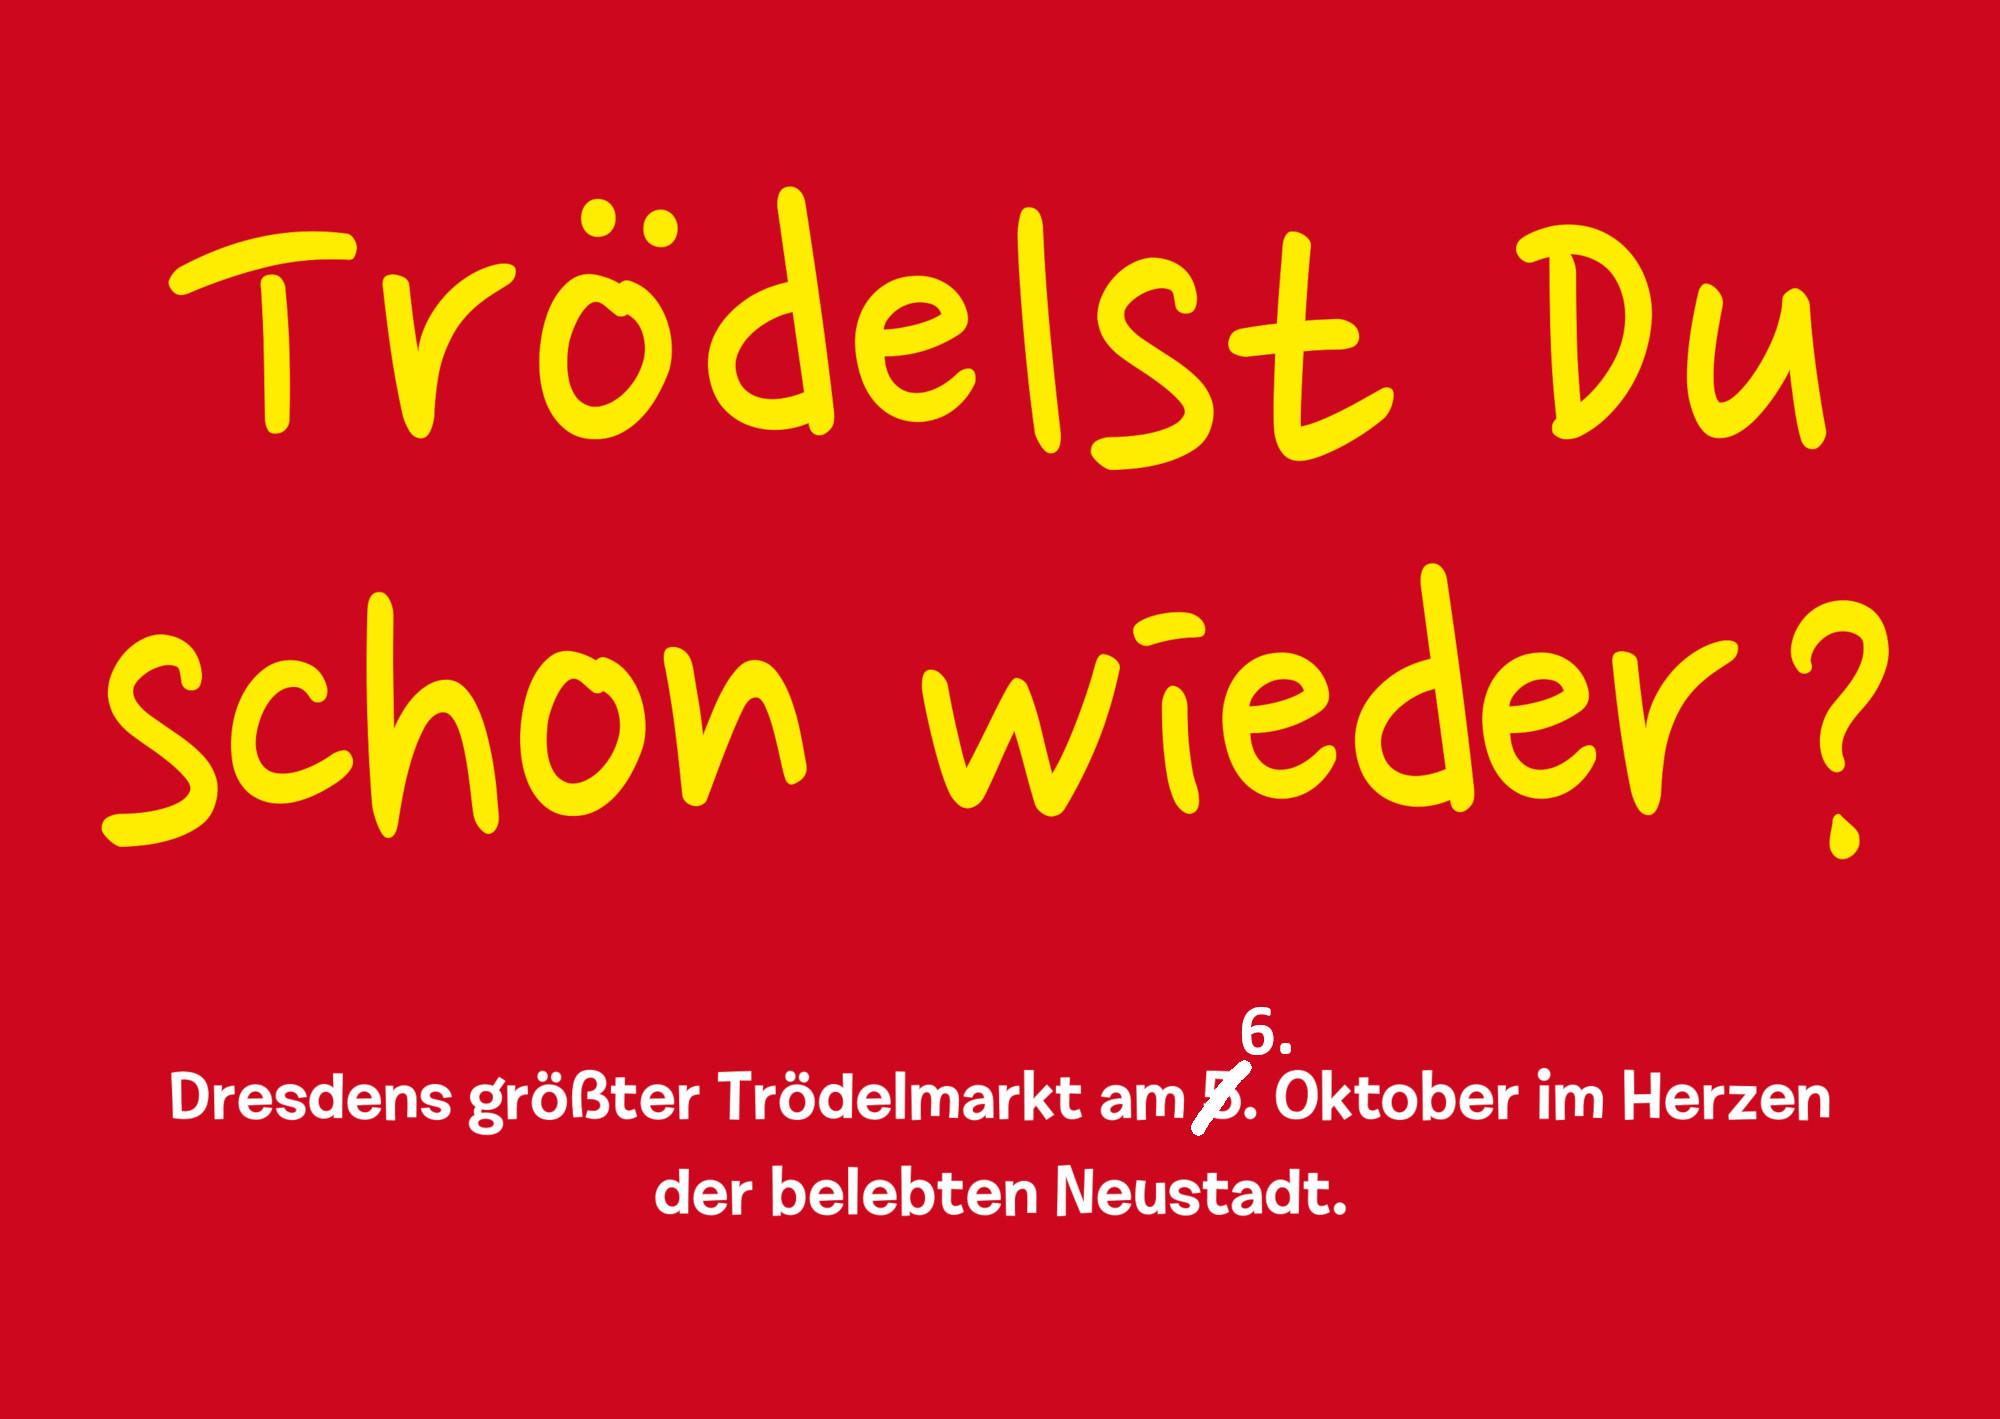 Trödelmarkt am 6. Oktober